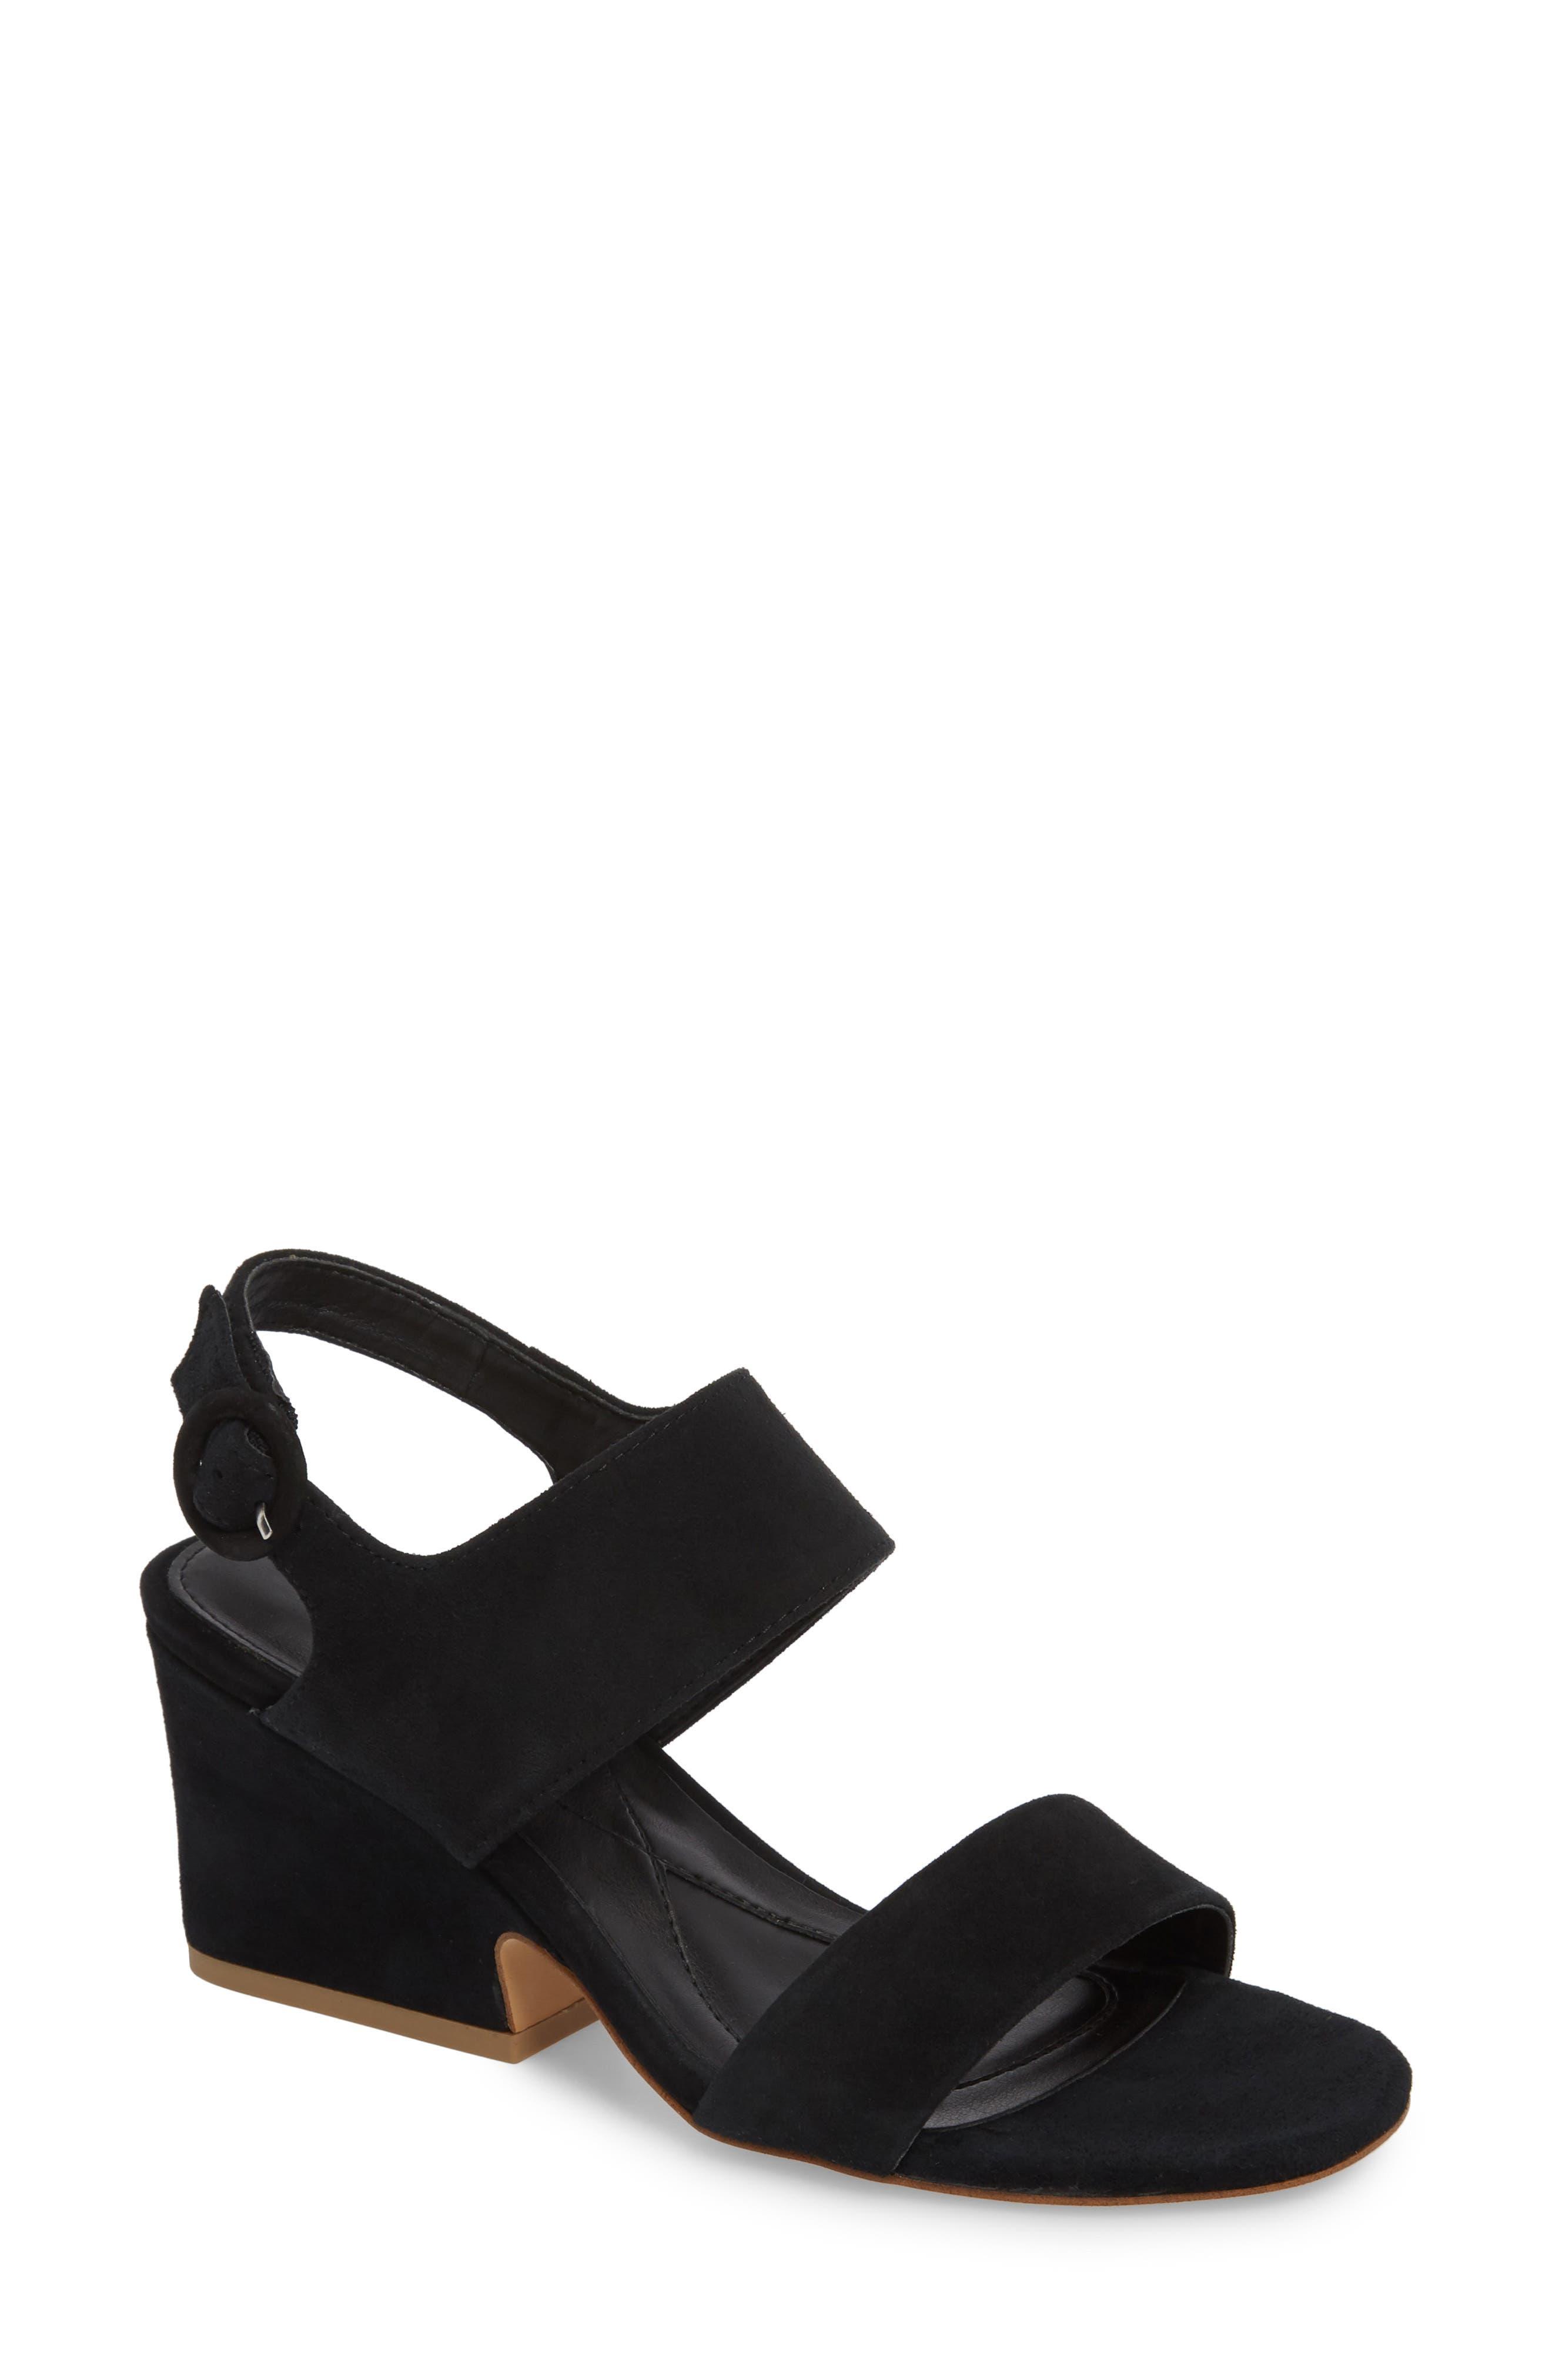 Isola Landra Block Heel Sandal, Main, color, BLACK SUEDE